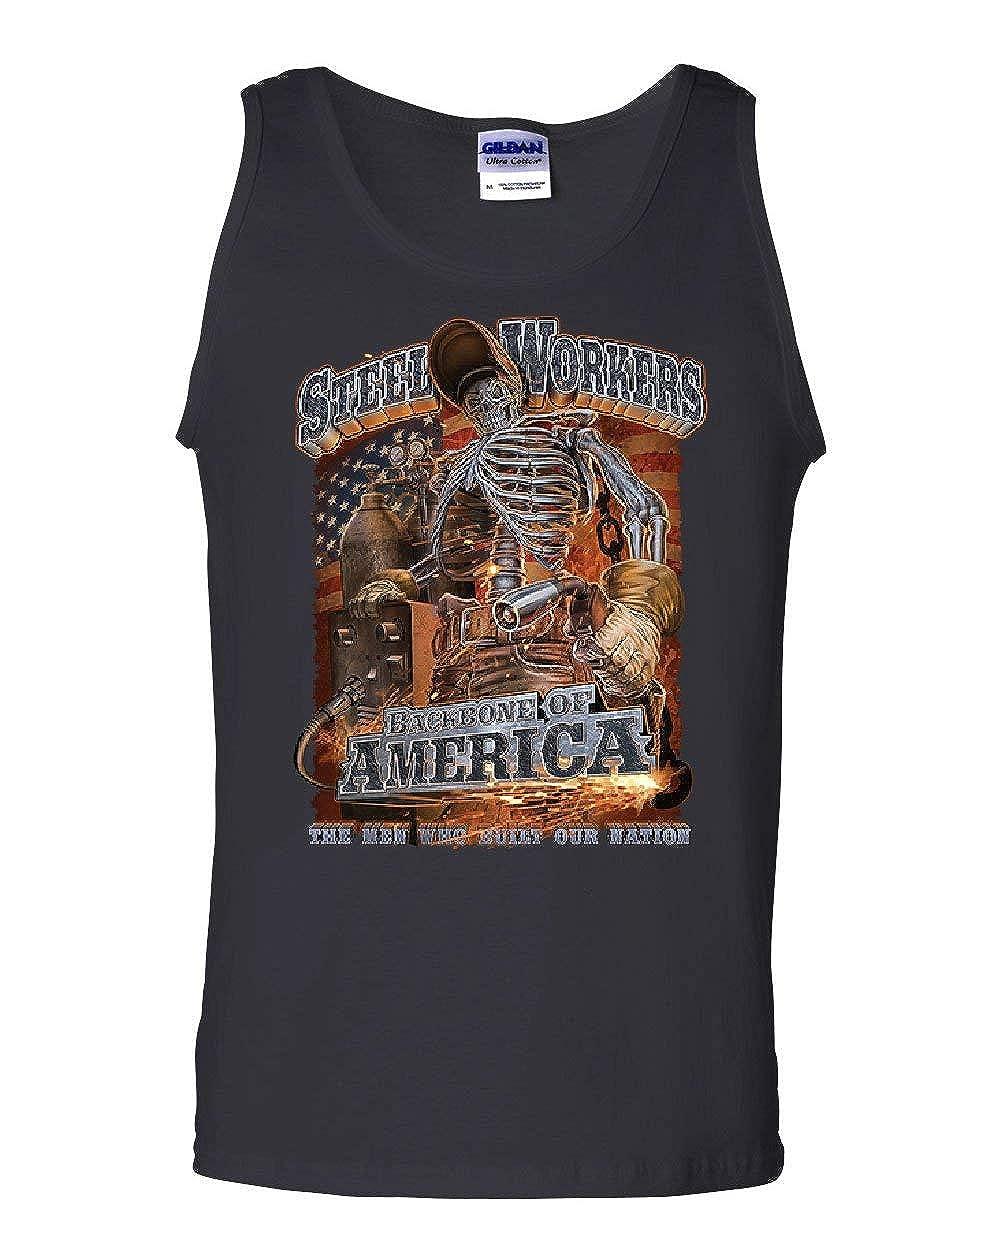 Steel Workers Backbone of America Tank Top Welding Iron Metal Sleeveless